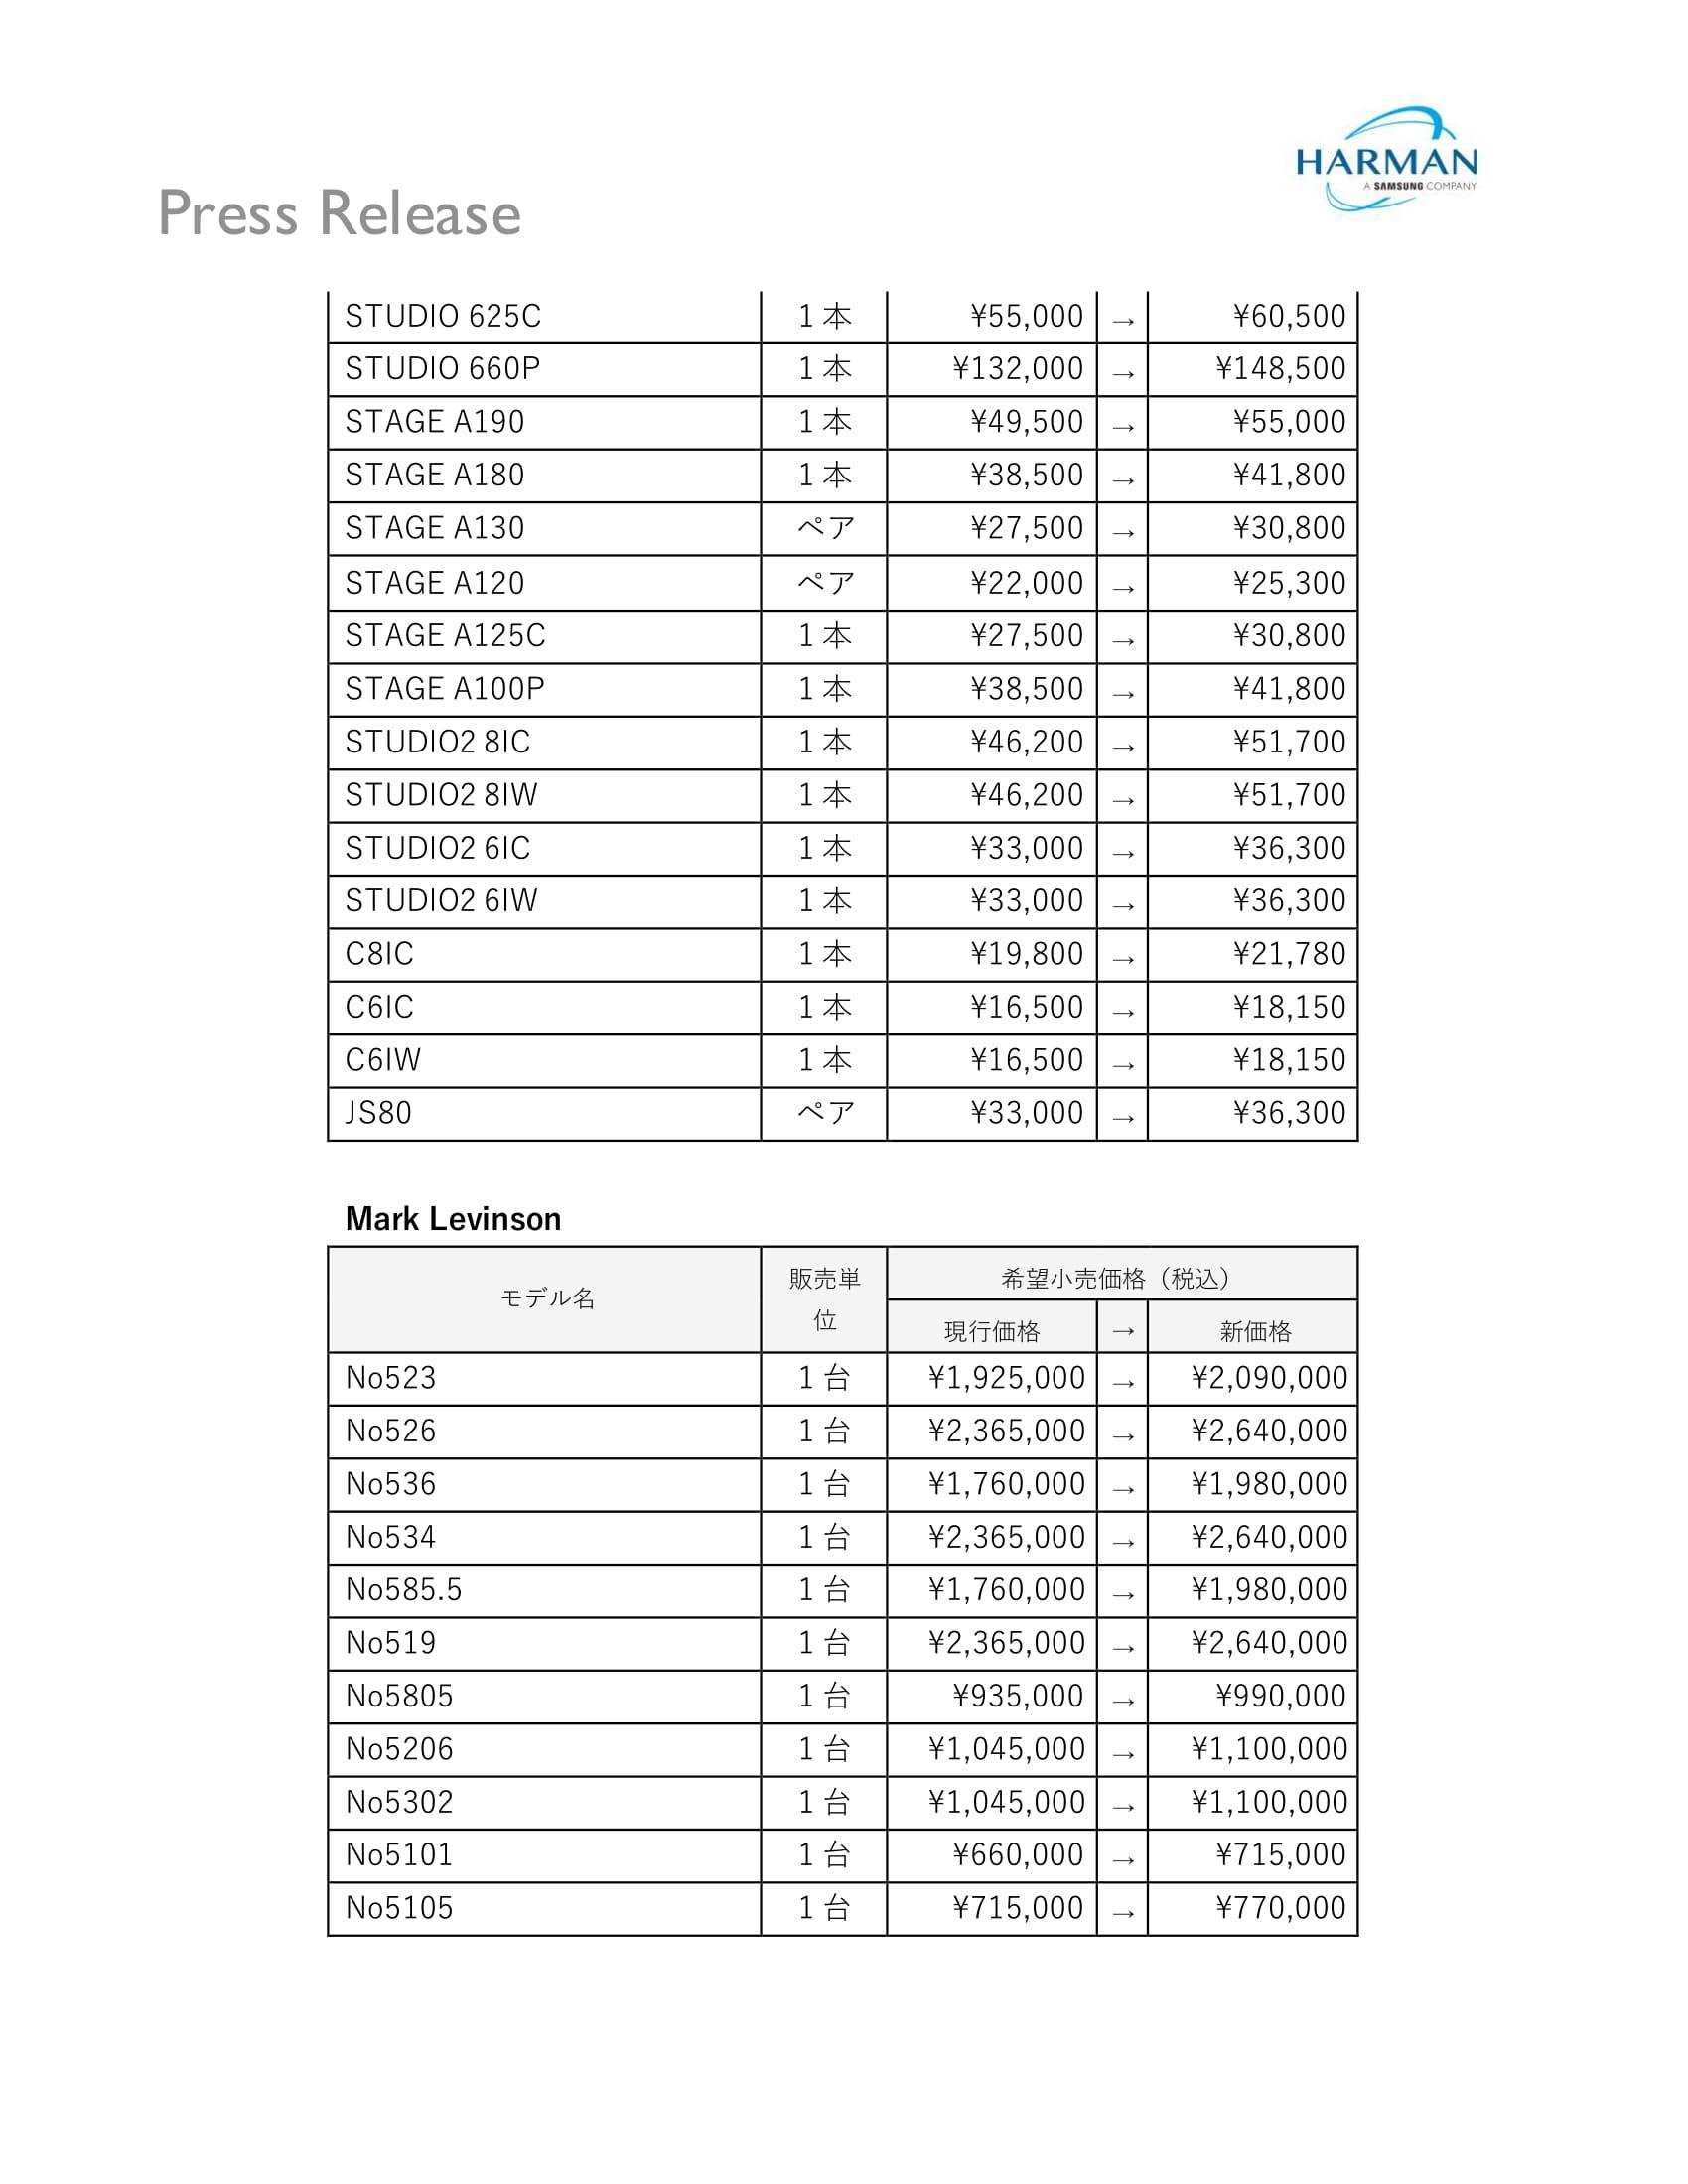 【PRESS RELEASE】JBLおよびMark Levinson 一部製品価格改定のお知らせ-2